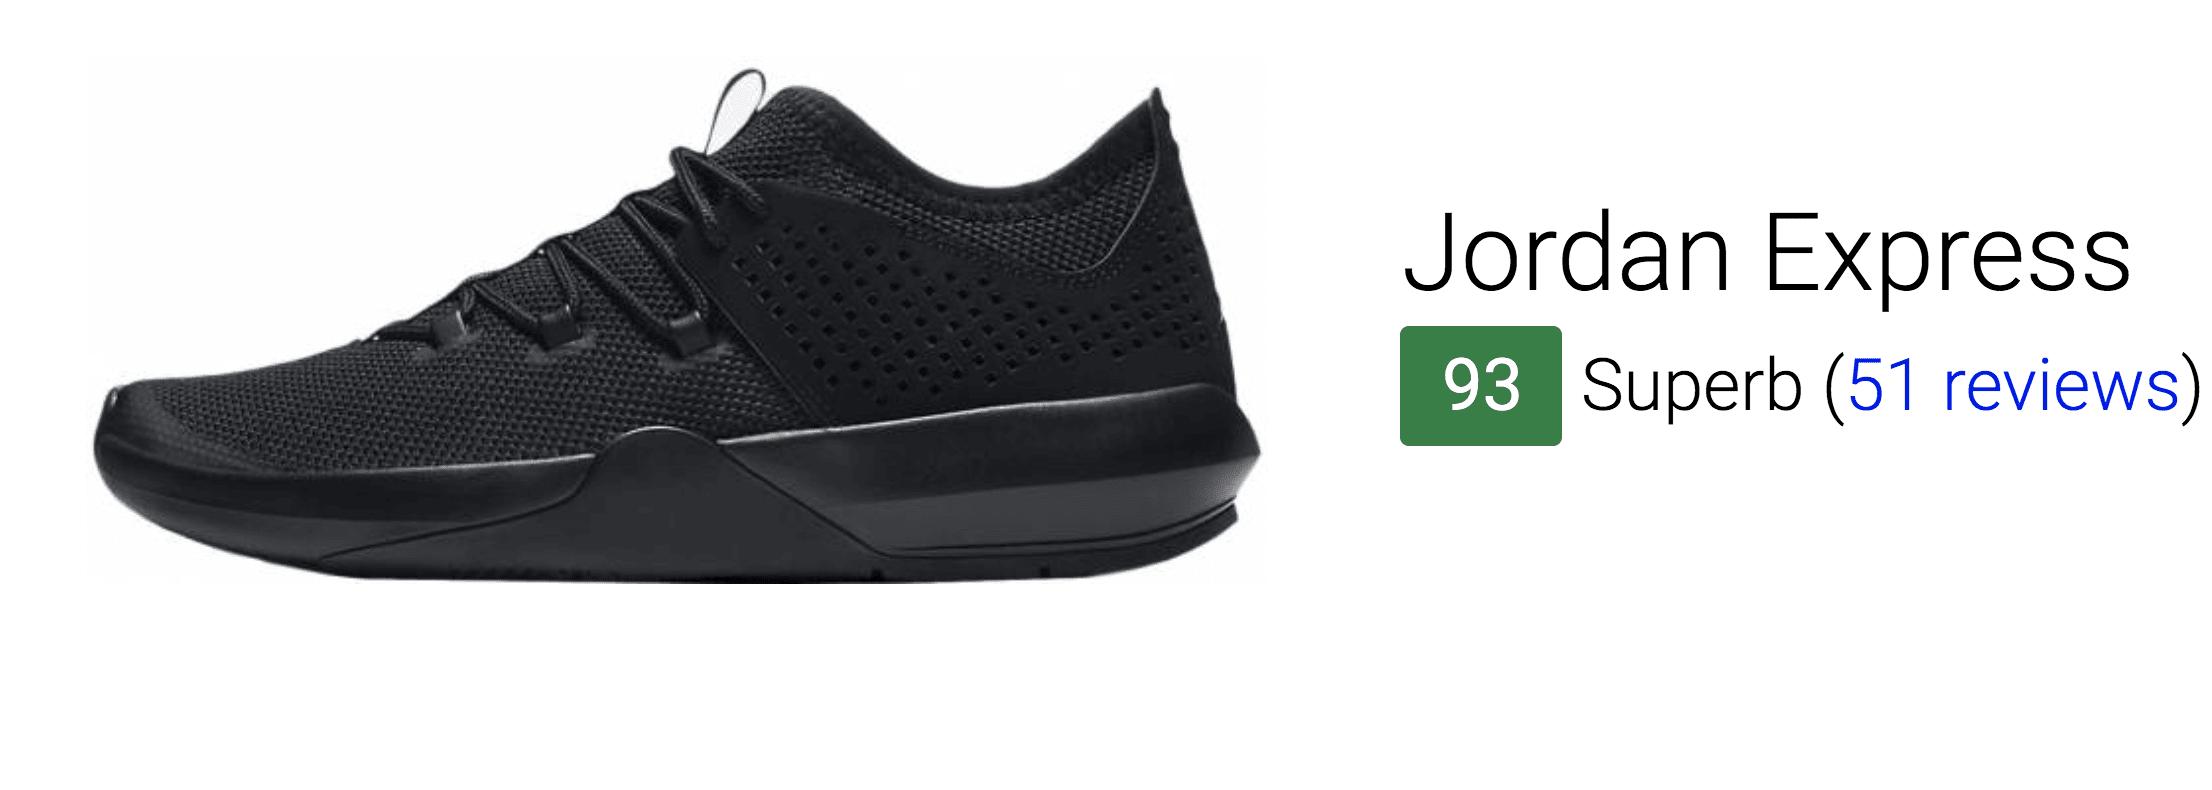 Best Jordan Casual Sneakers